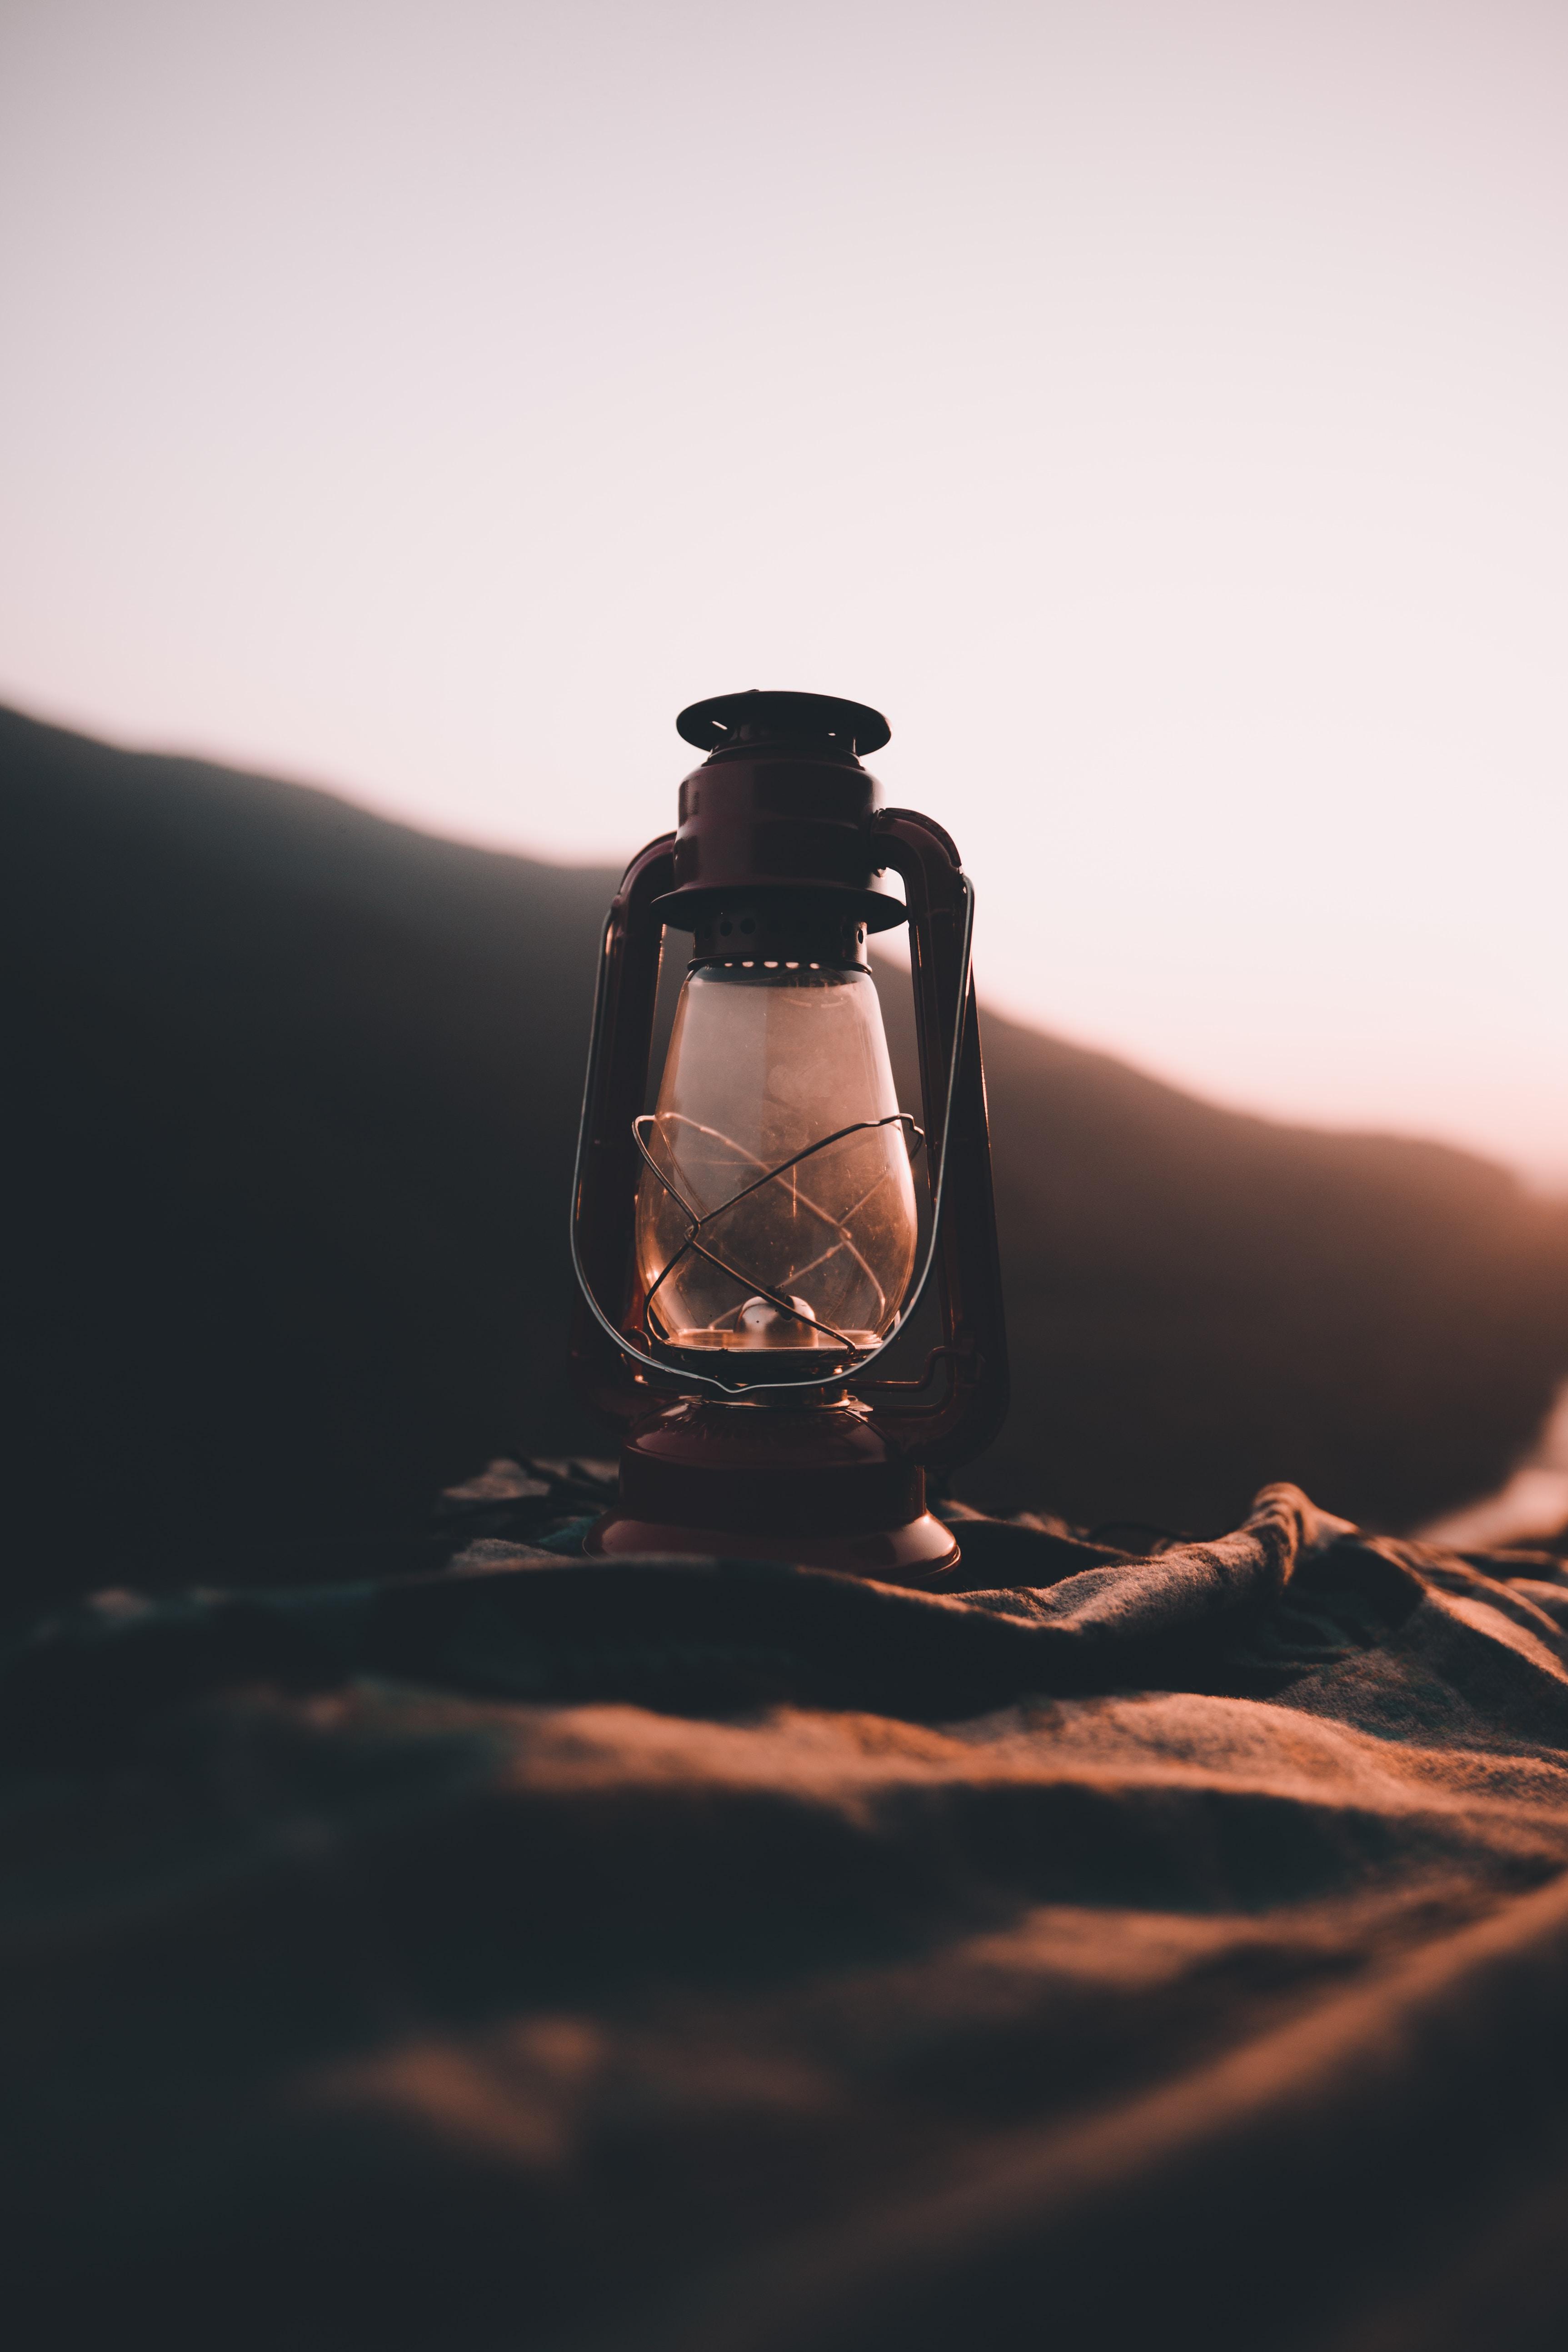 turned-off oil lantern